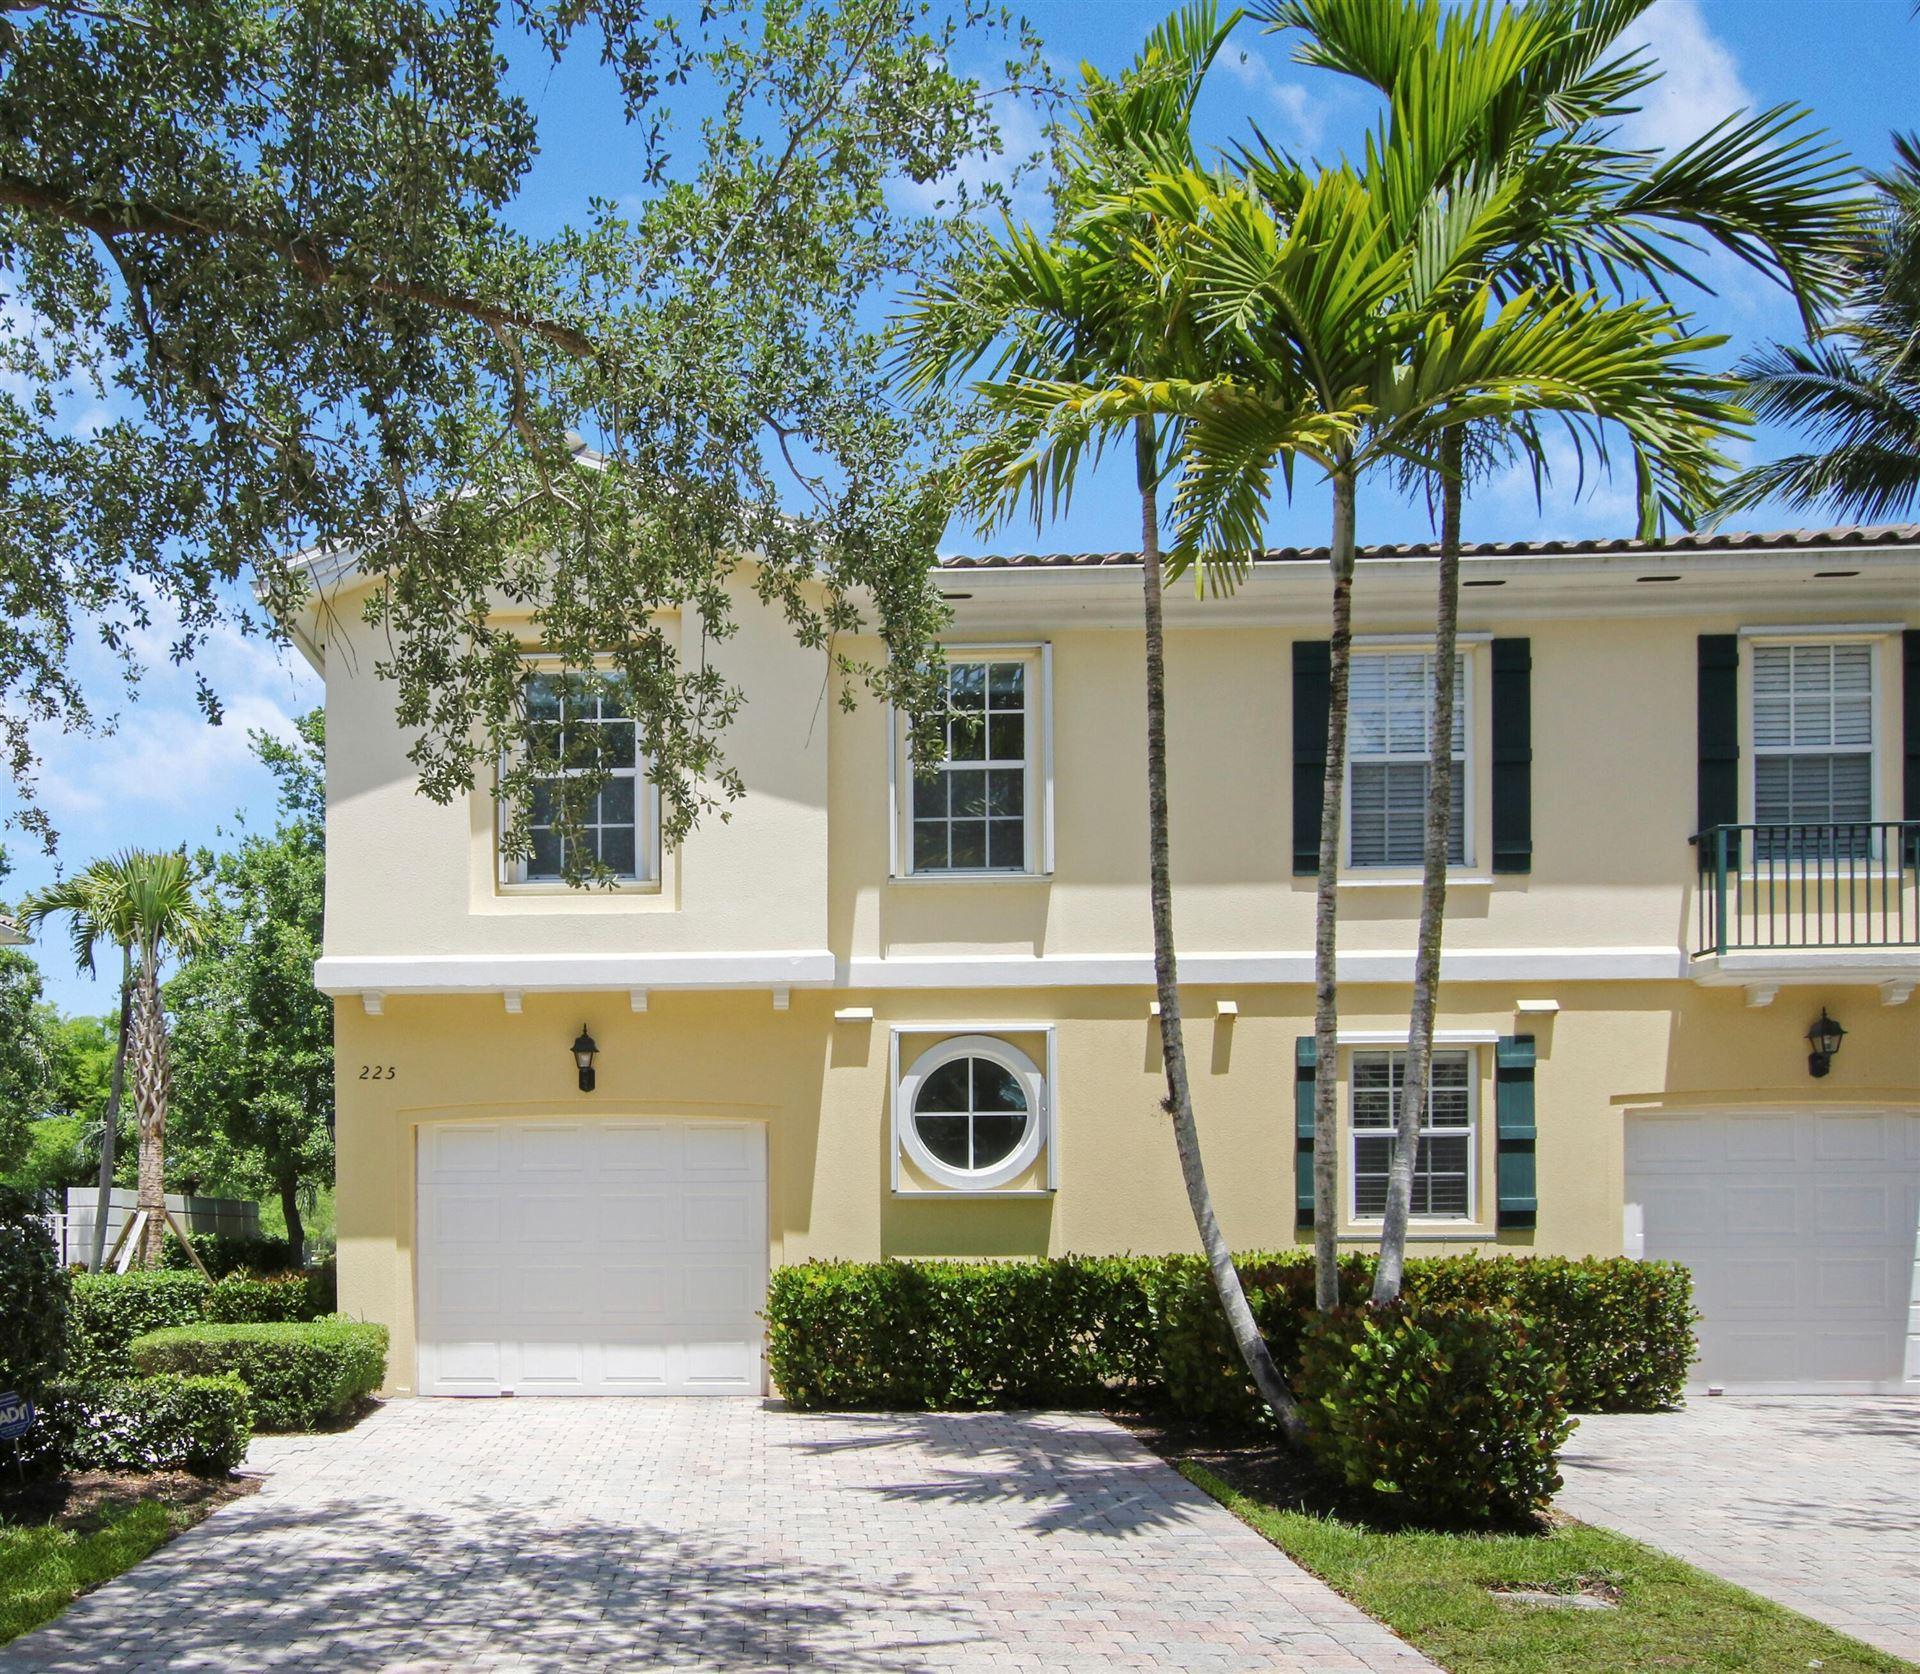 225 Fortuna Drive, Palm Beach Gardens, FL 33410 - MLS#: RX-10712274